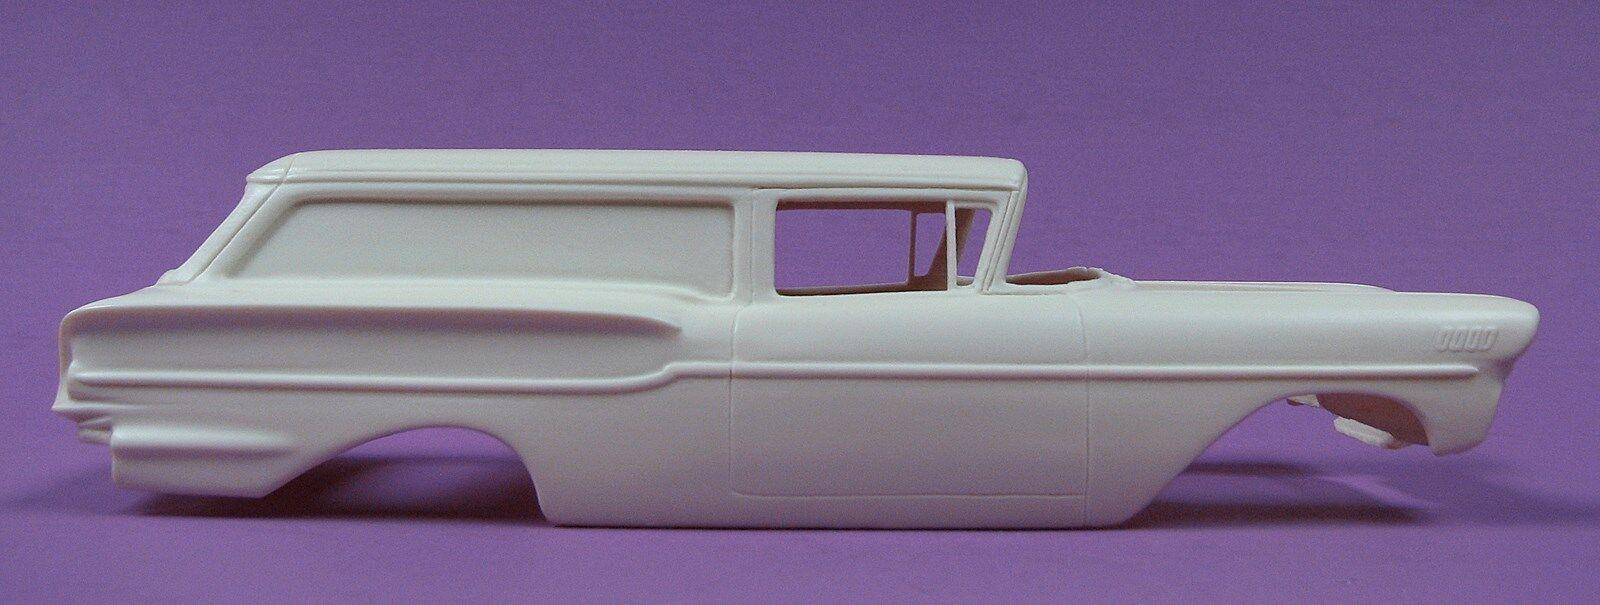 Jimmy Flintstone 1958 Chevy Sedan Delivery Resin Body 195 Ebay 1941 Ford Norton Secured Powered By Verisign